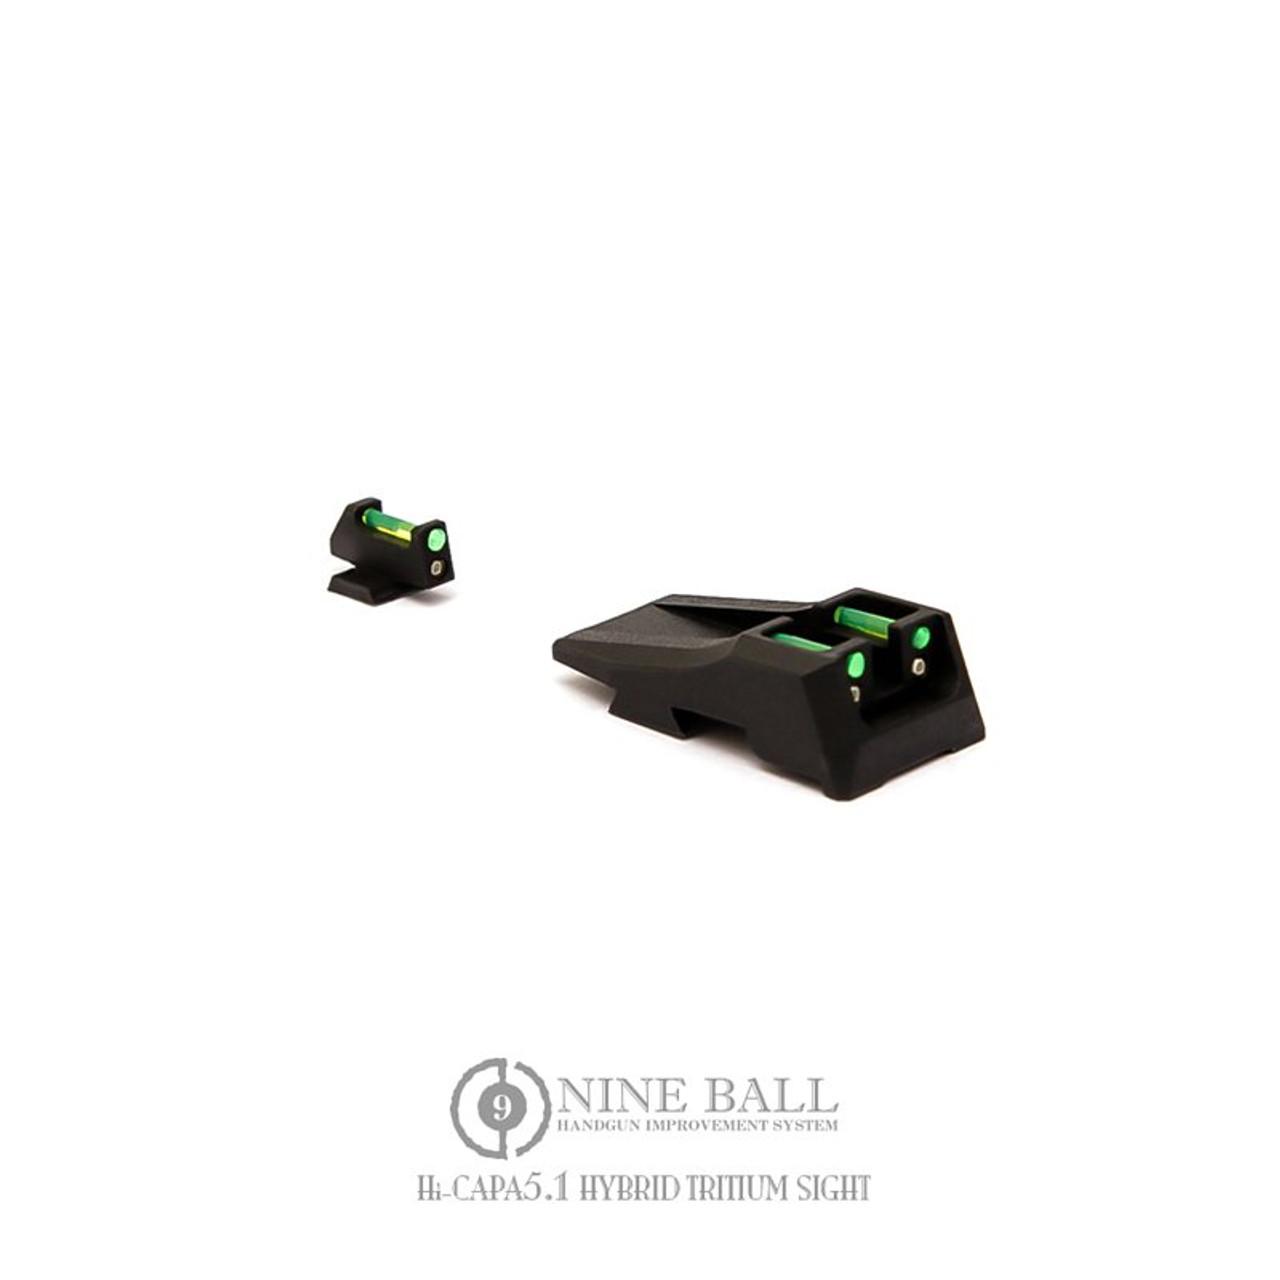 Nine Ball - Hi-CAPA5.1 HYBRID TRITIUM SIGHT